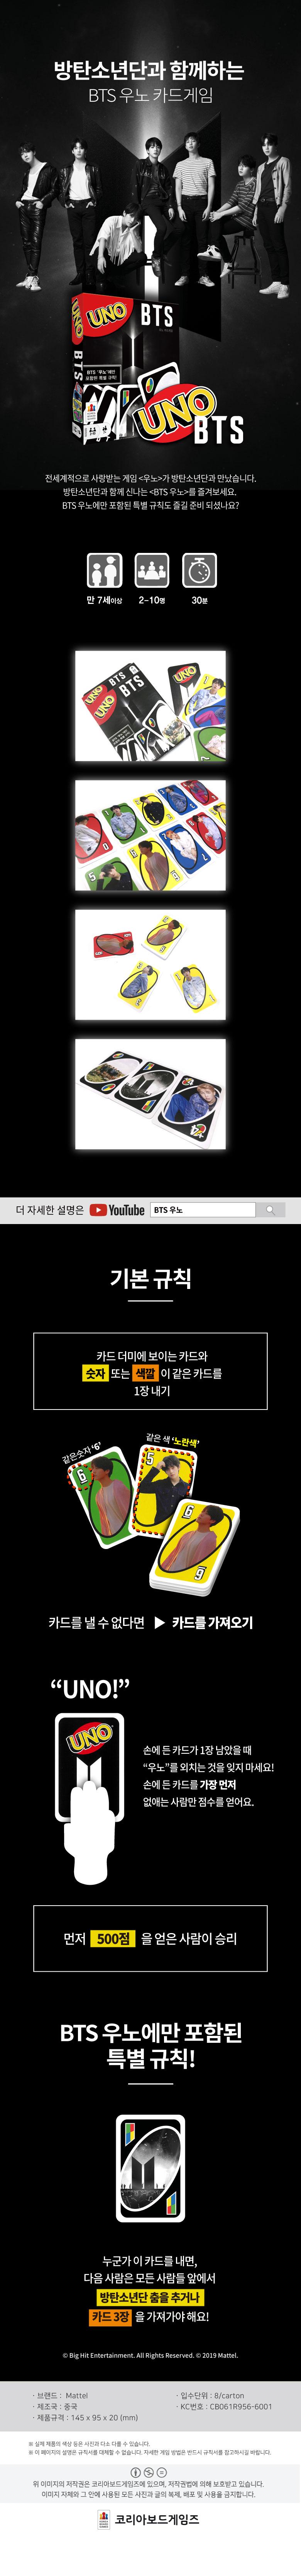 BTS 우노 카드 보드게임 - 코리아보드게임즈, 14,000원, 보드게임, 두뇌 게임